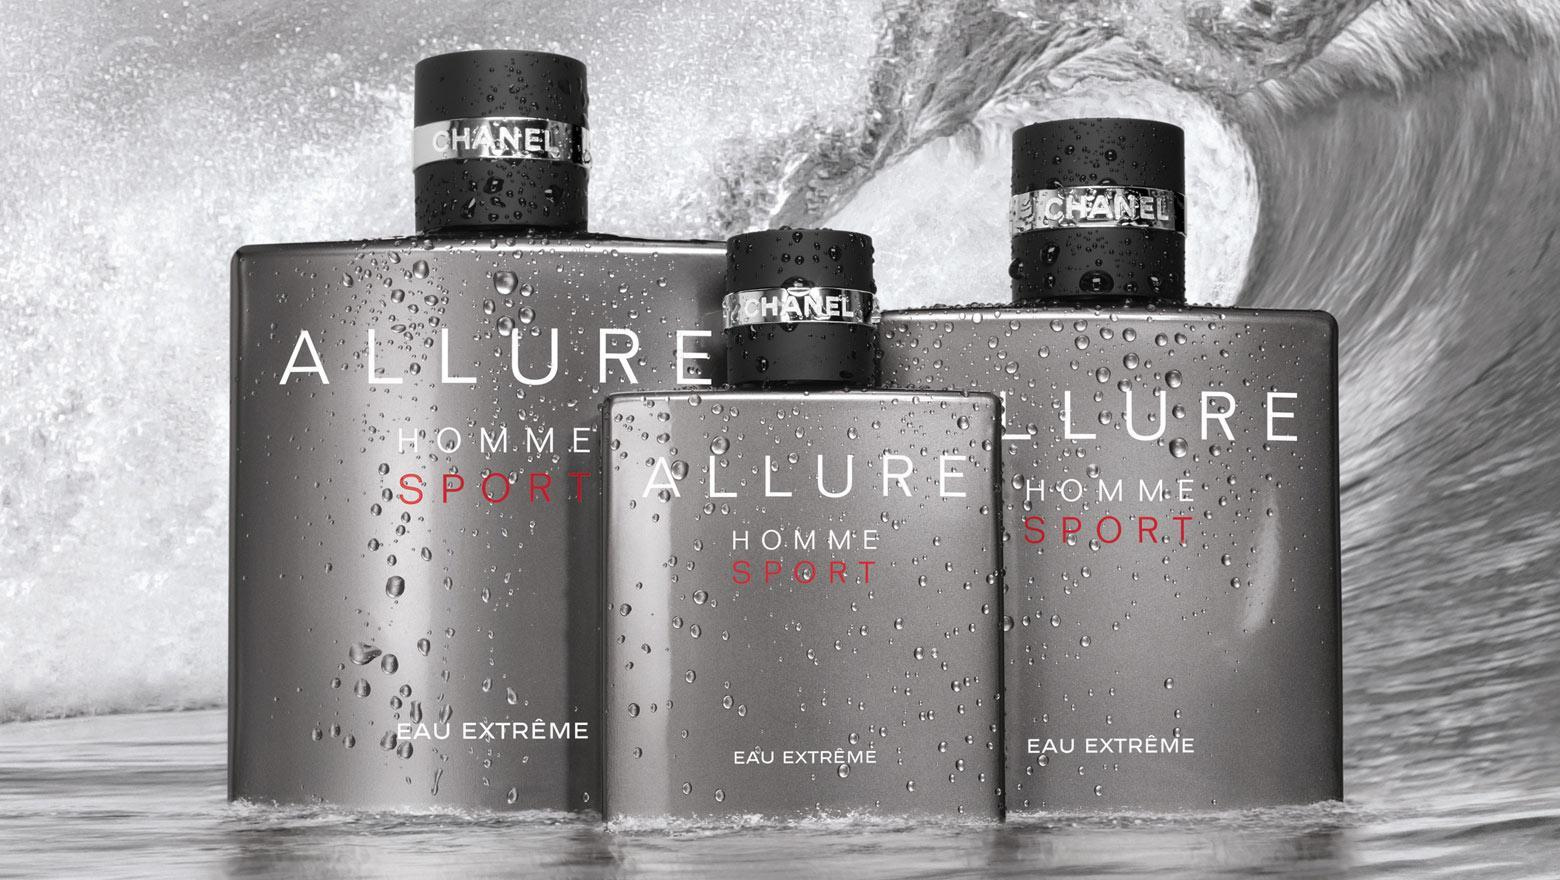 Chanel Allure Homme Sporte